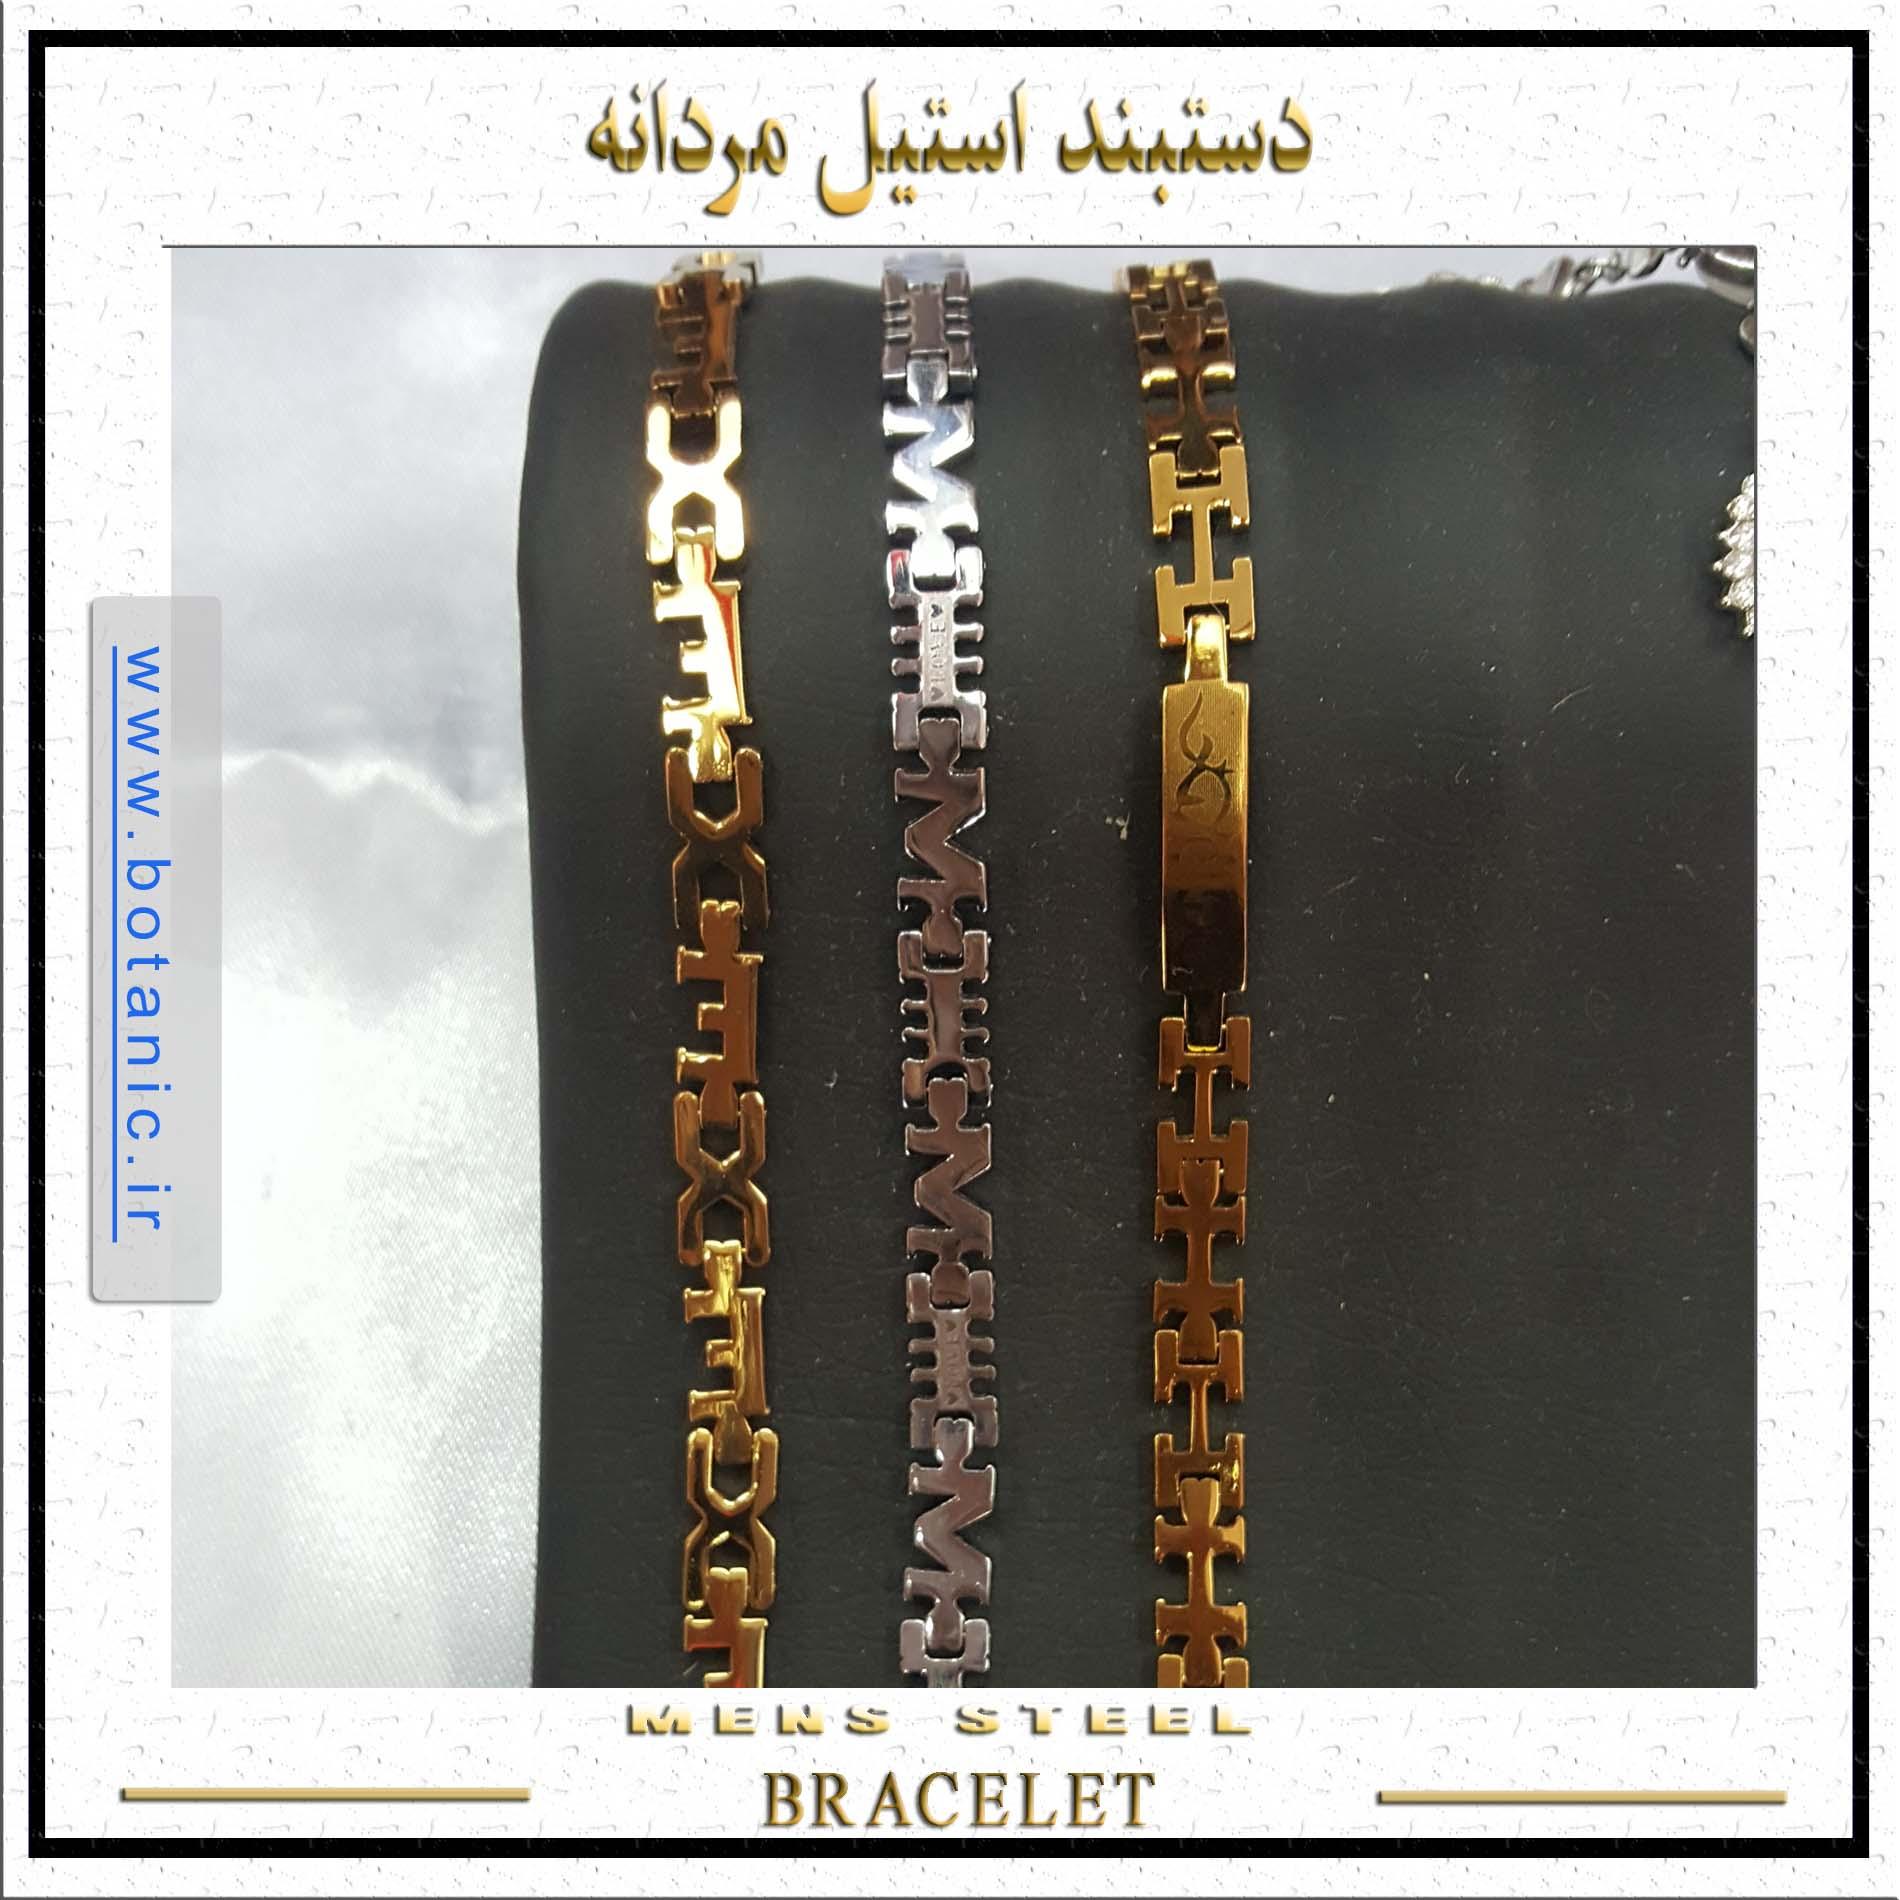 Mens Steel Bracelet